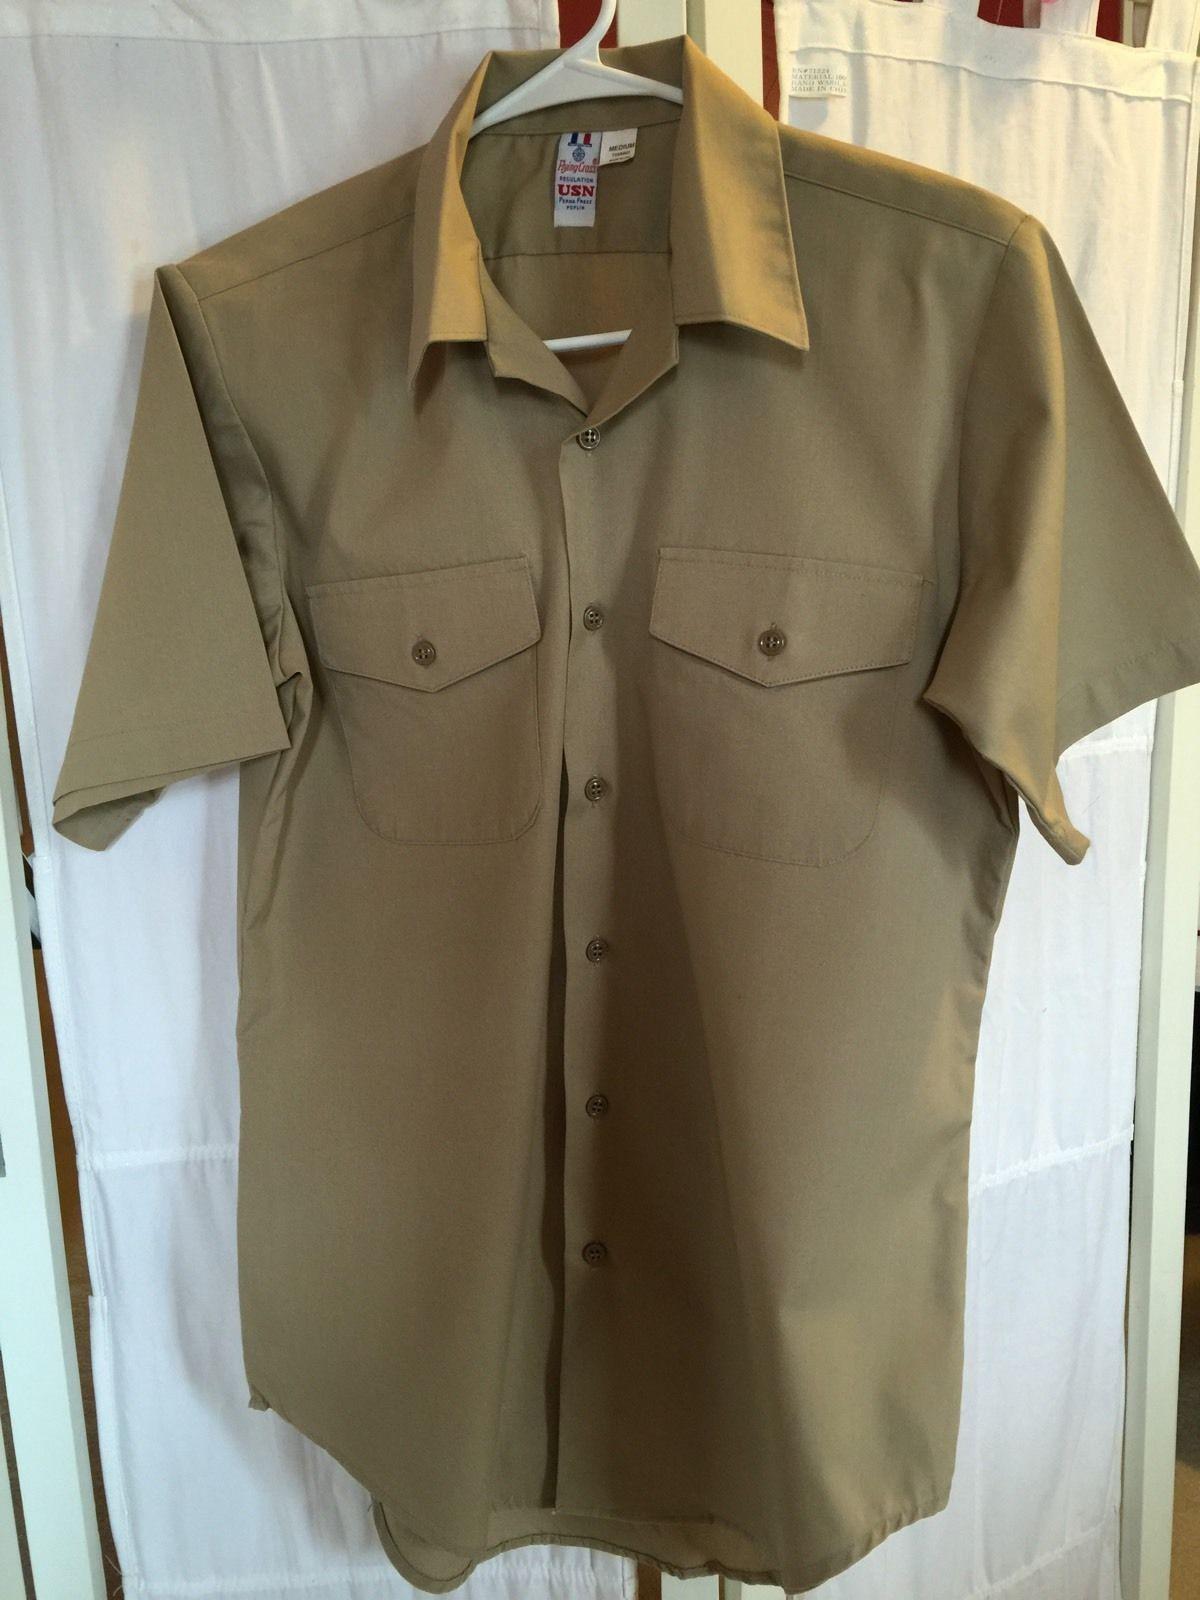 Navy Flying Cross Regulation USN Khaki Service Shirt